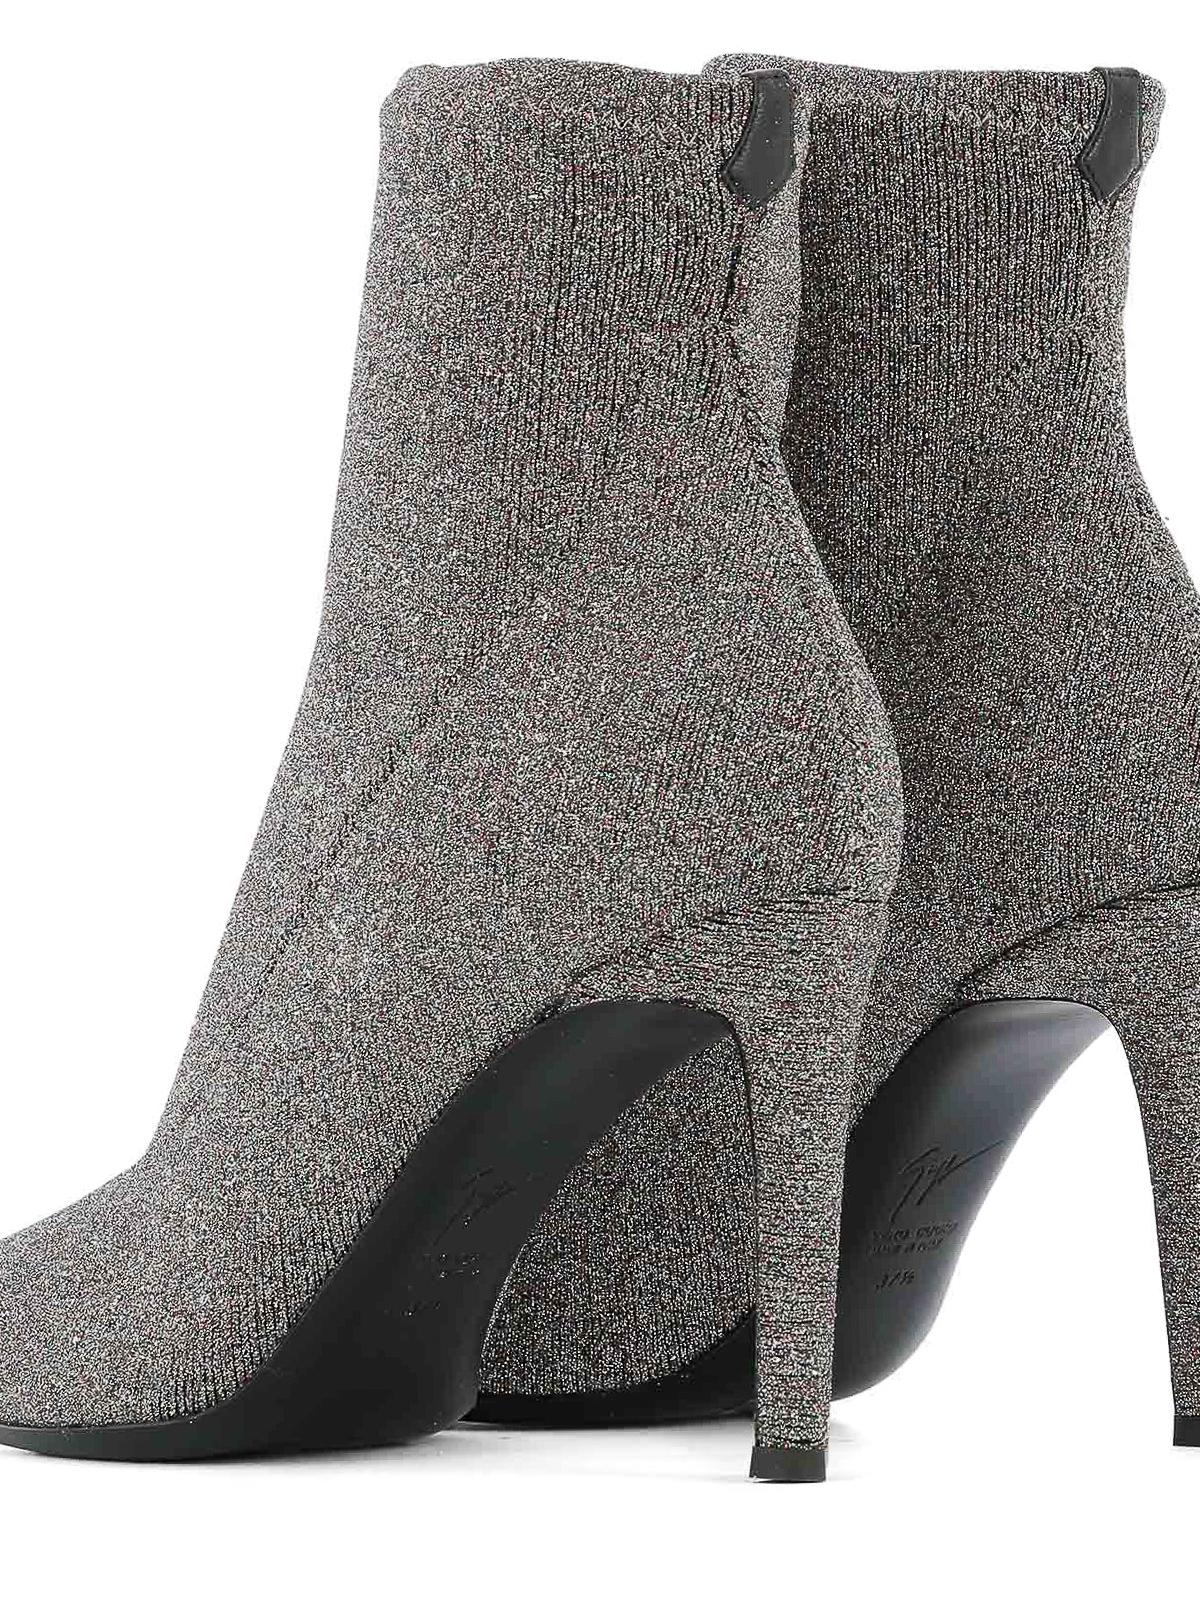 Booties Ankle Celeste Boots Zanotti Fabric Glittered Giuseppe n17qg7